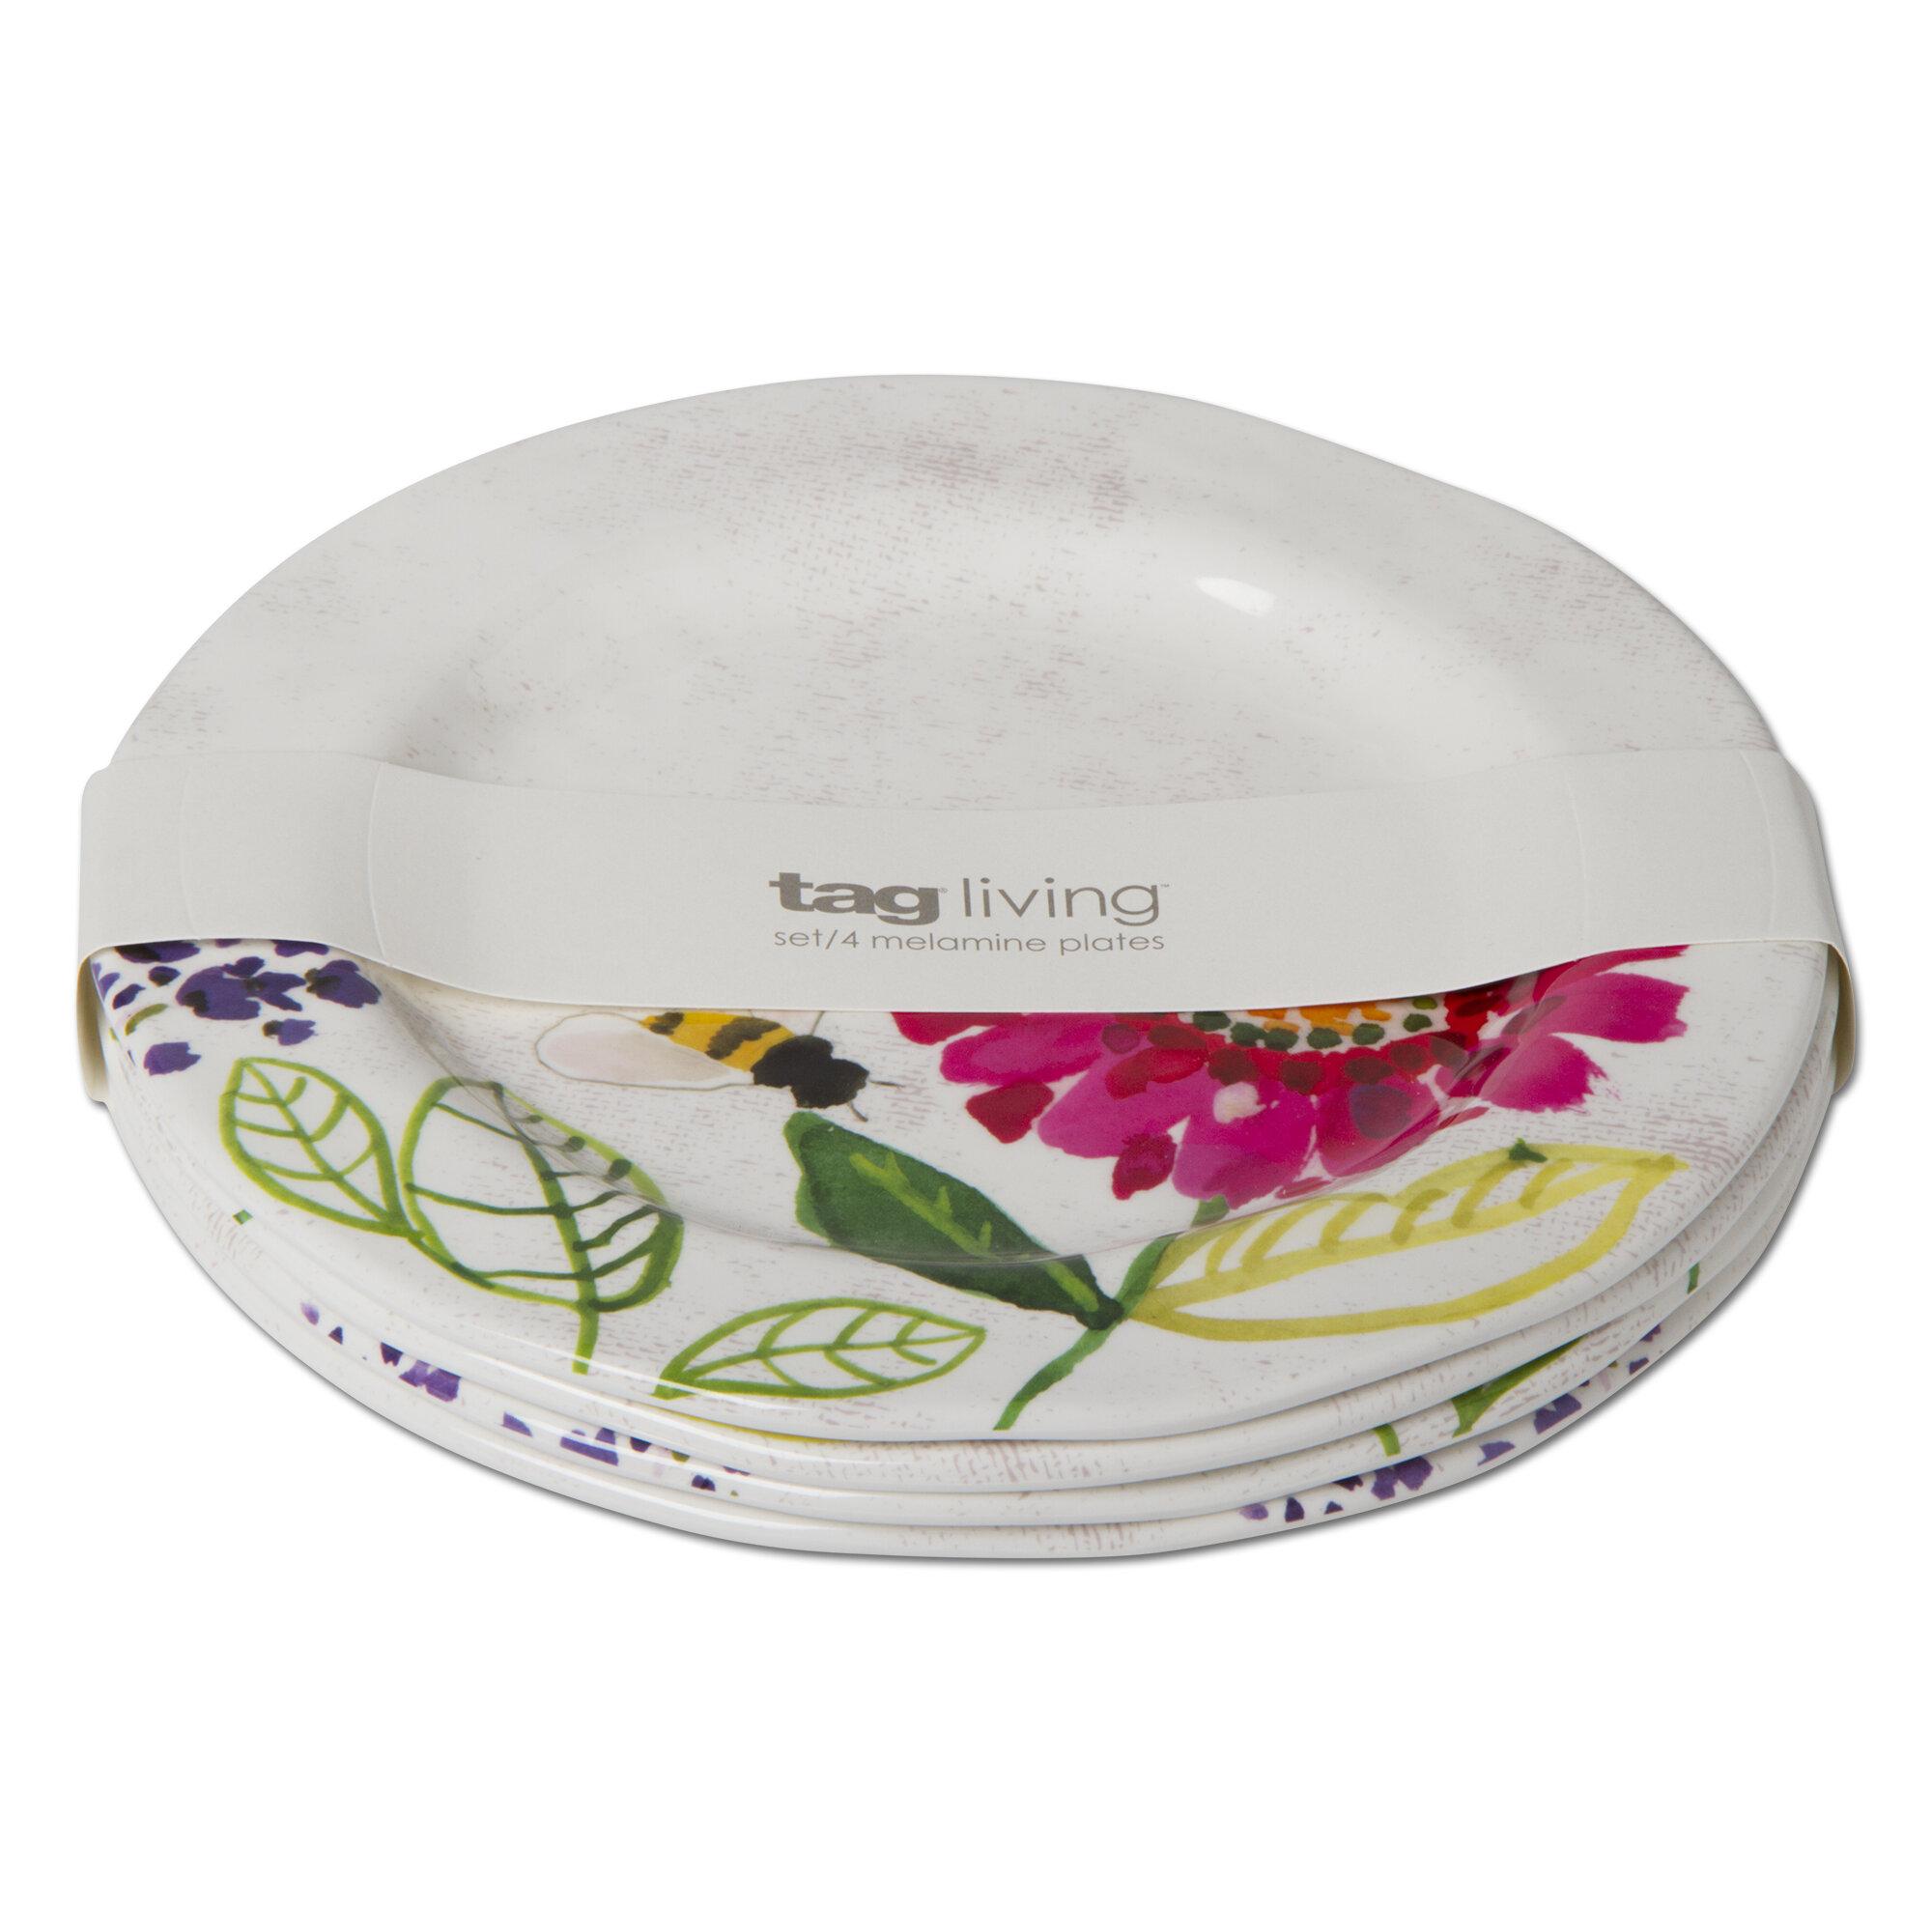 sc 1 st  Wayfair & TAG Fresh Flowers 4 Piece Melamine Salad or Dessert Plate Set | Wayfair